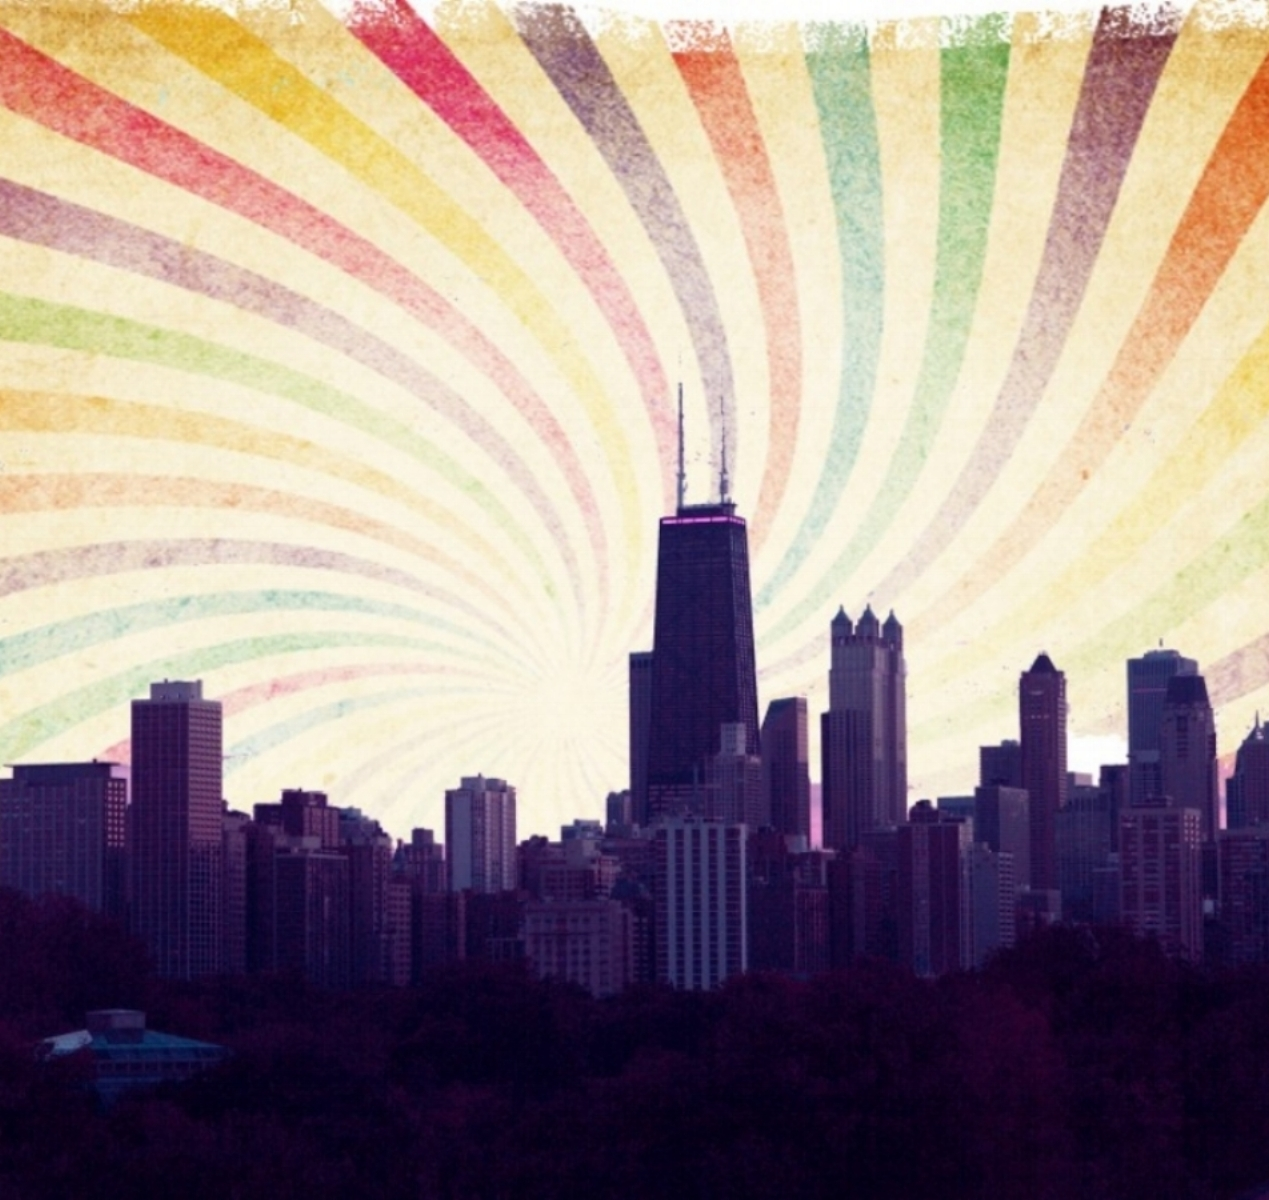 Rainbow-Coalition-publicity-image-1024x683.jpg